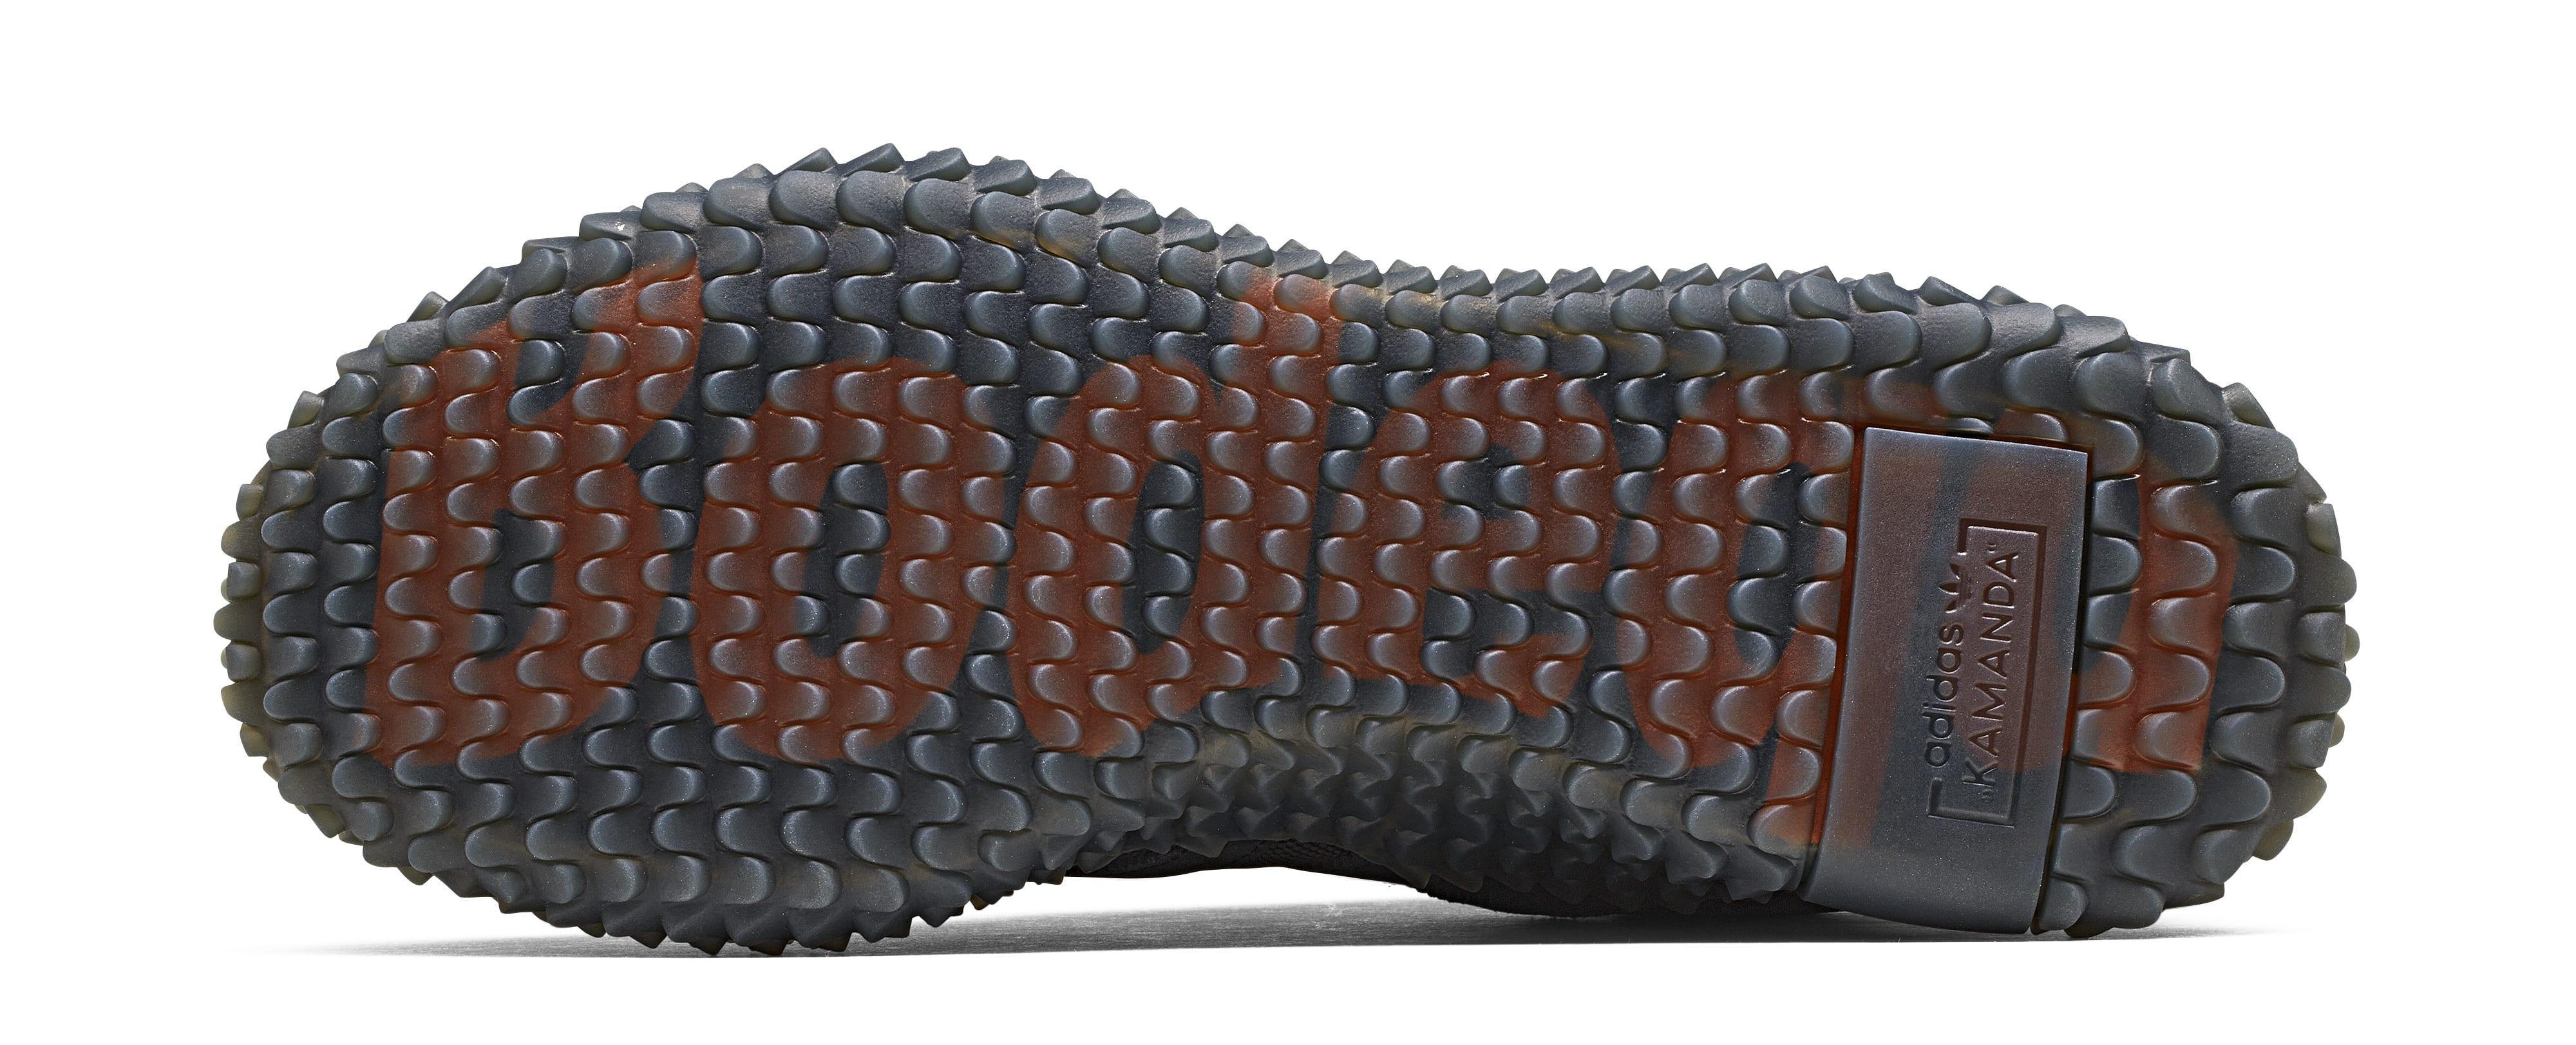 Bodega x Adidas Kamanda BB9243 (Sole)